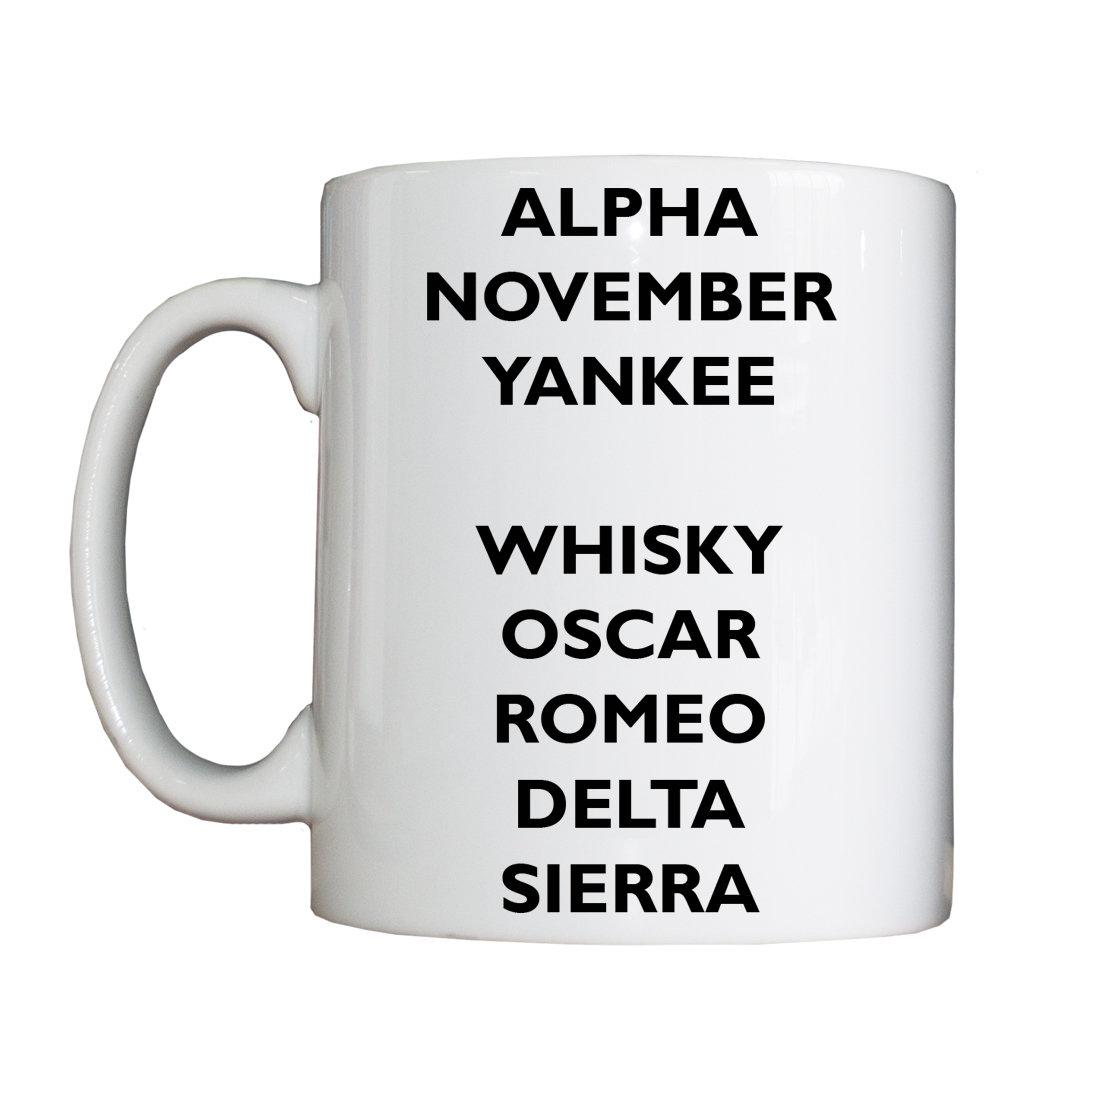 Personalised 'Phonetic' Drinking Vessel (Mug) PhoneticMUG